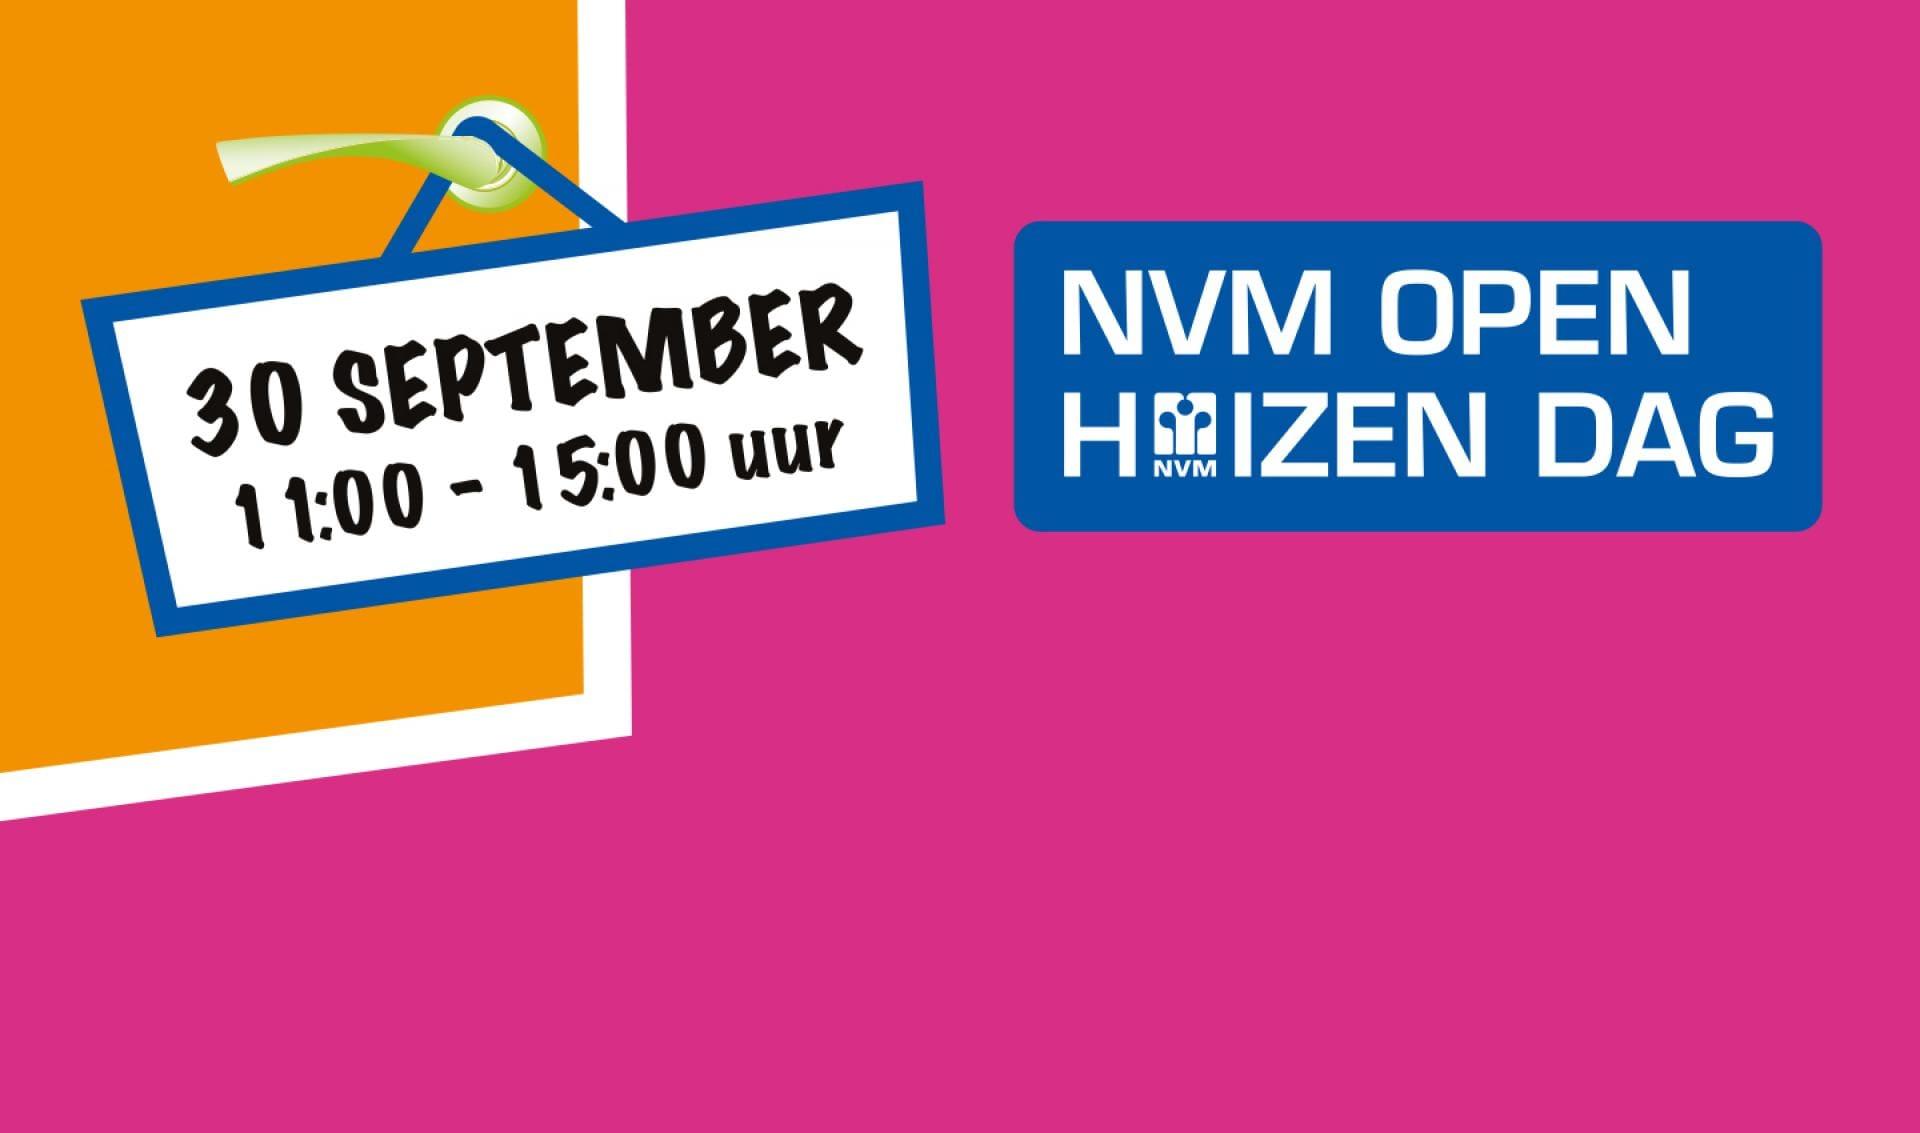 Open huizen dag zaterdag 30 september nederweert24 for Open huizen dag funda